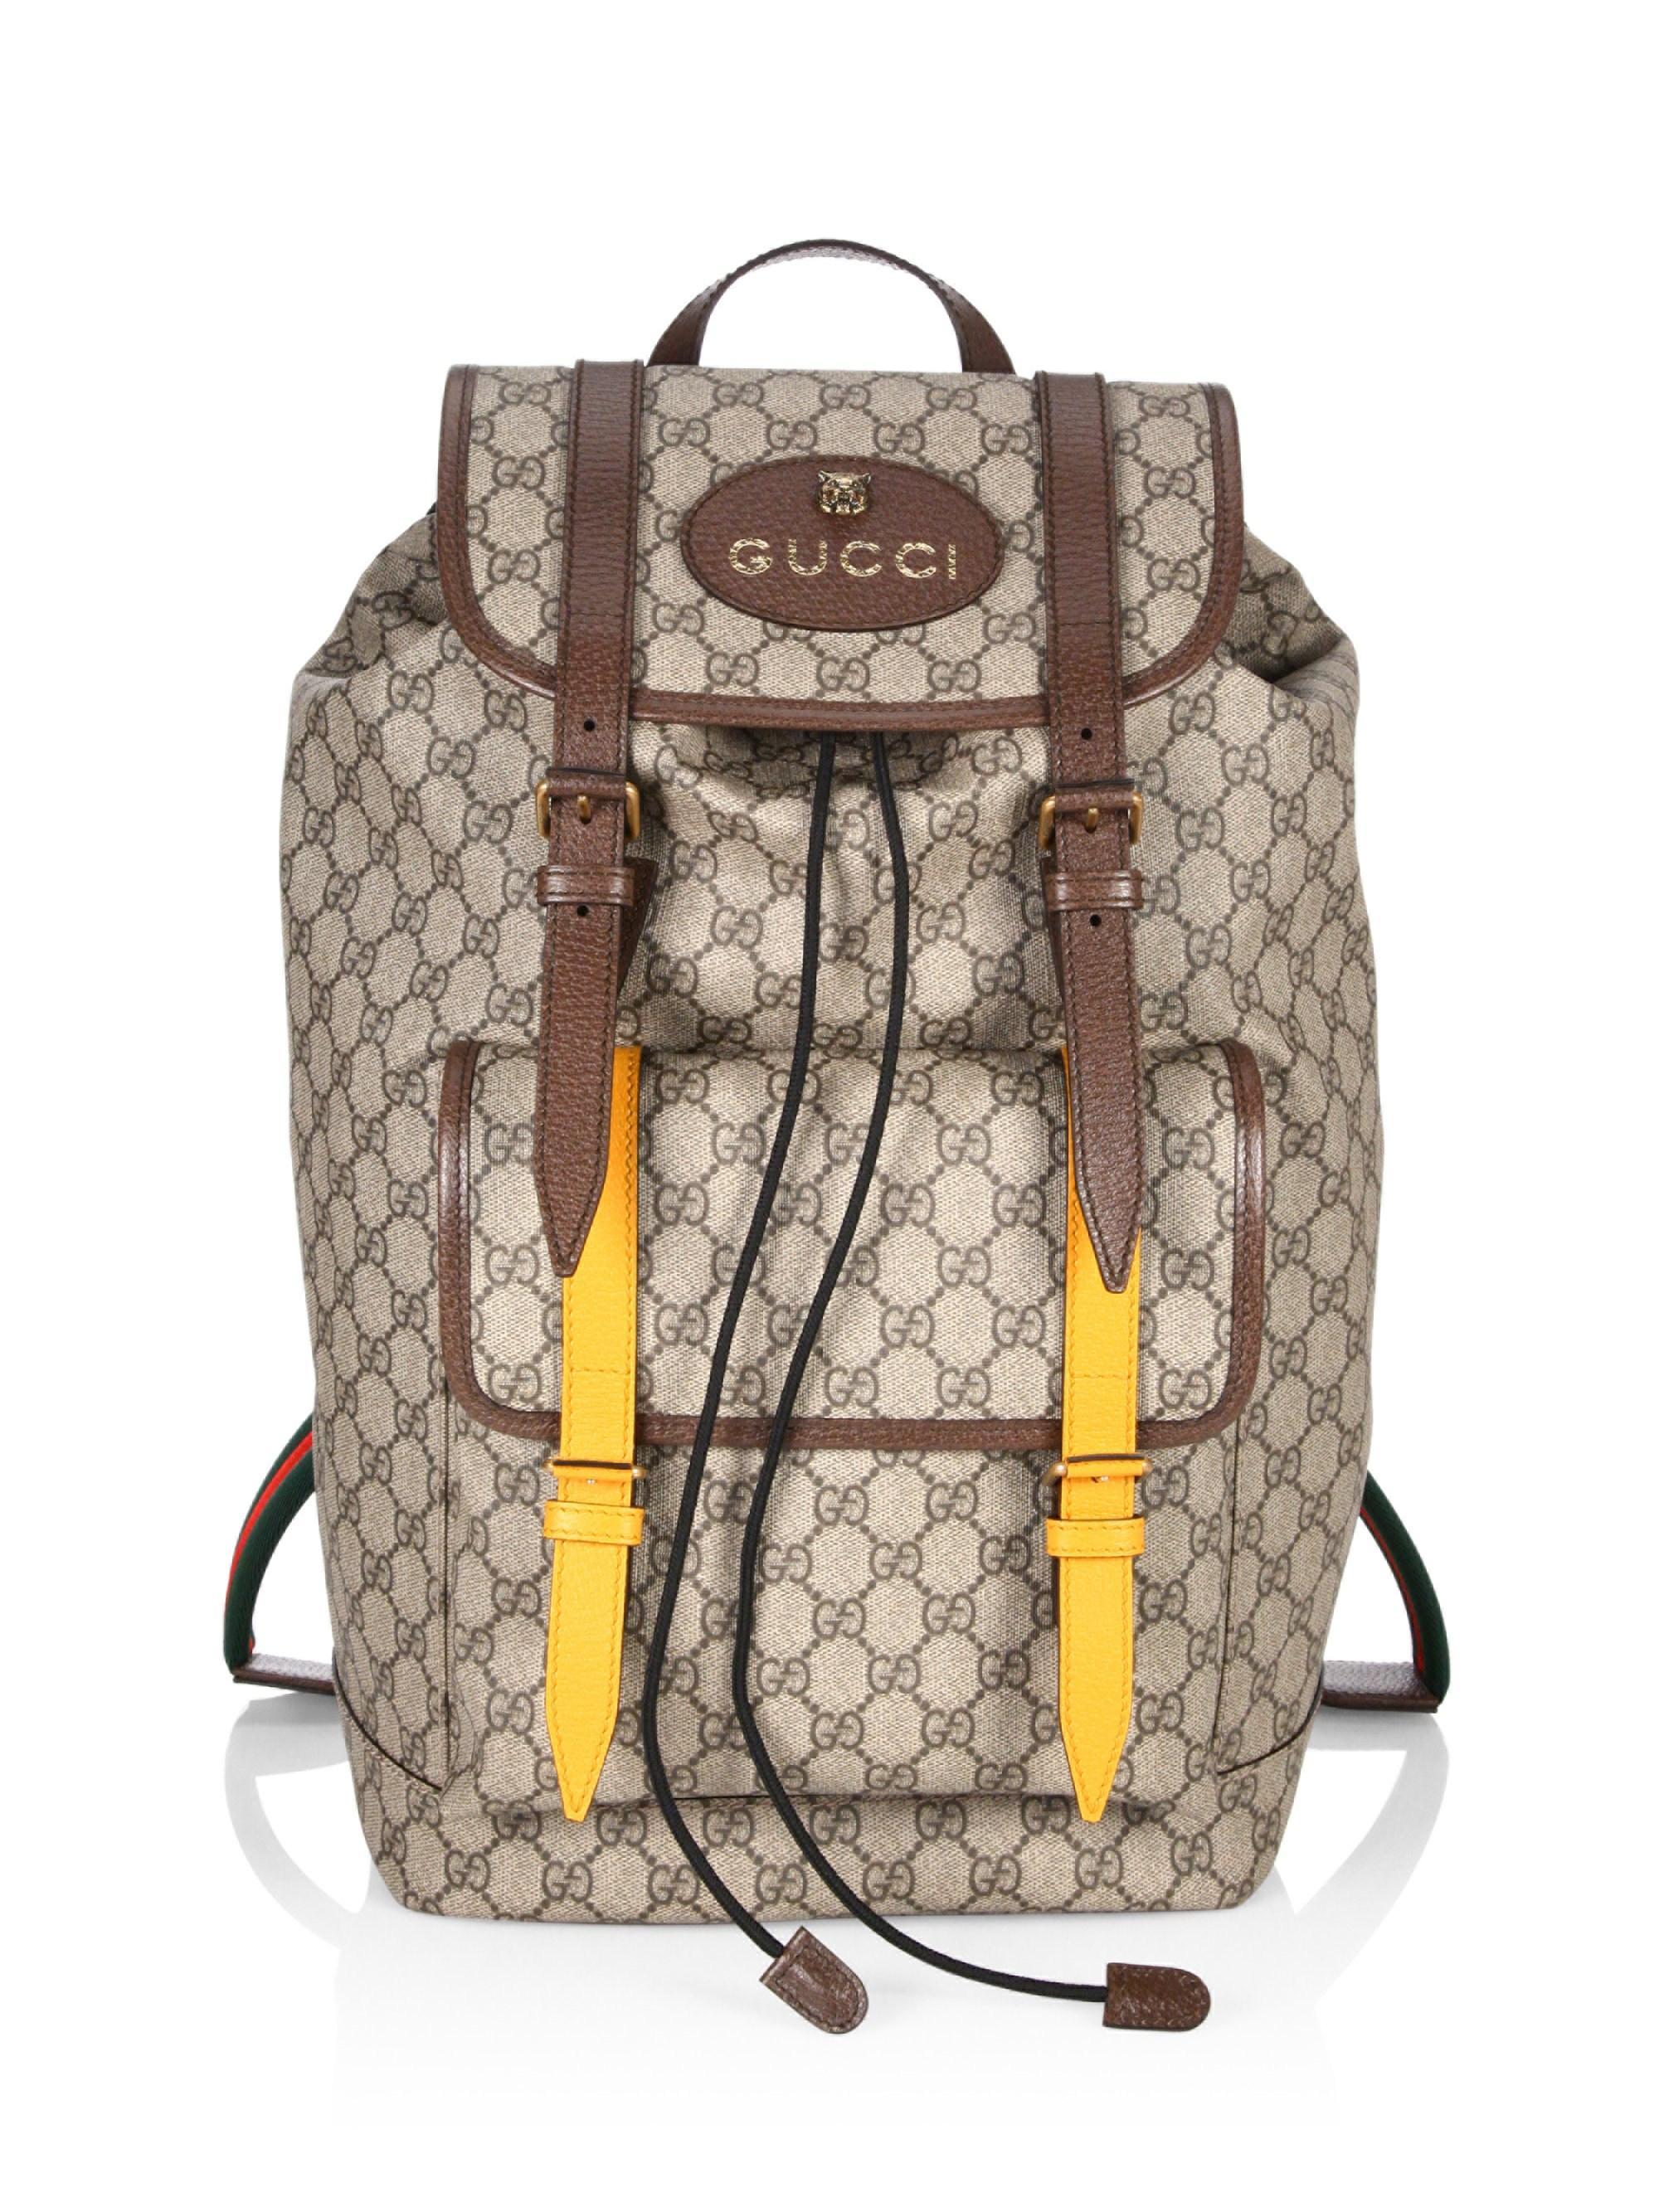 262446558a904f Gucci Men's GG Supreme Backpack - Beige in Natural for Men - Lyst